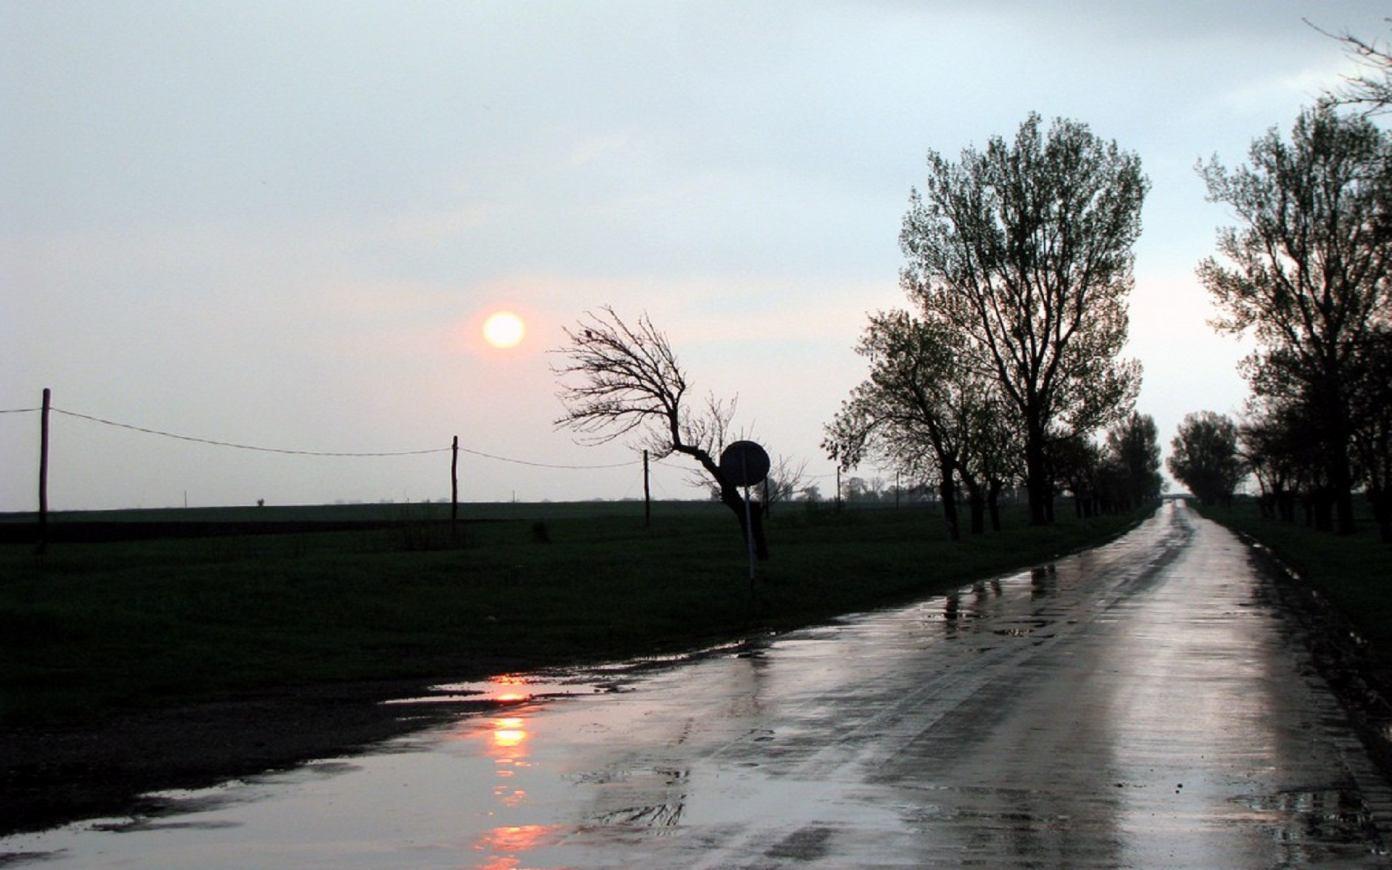 Gambar-Gambar Suasana Hujan Paling Keren